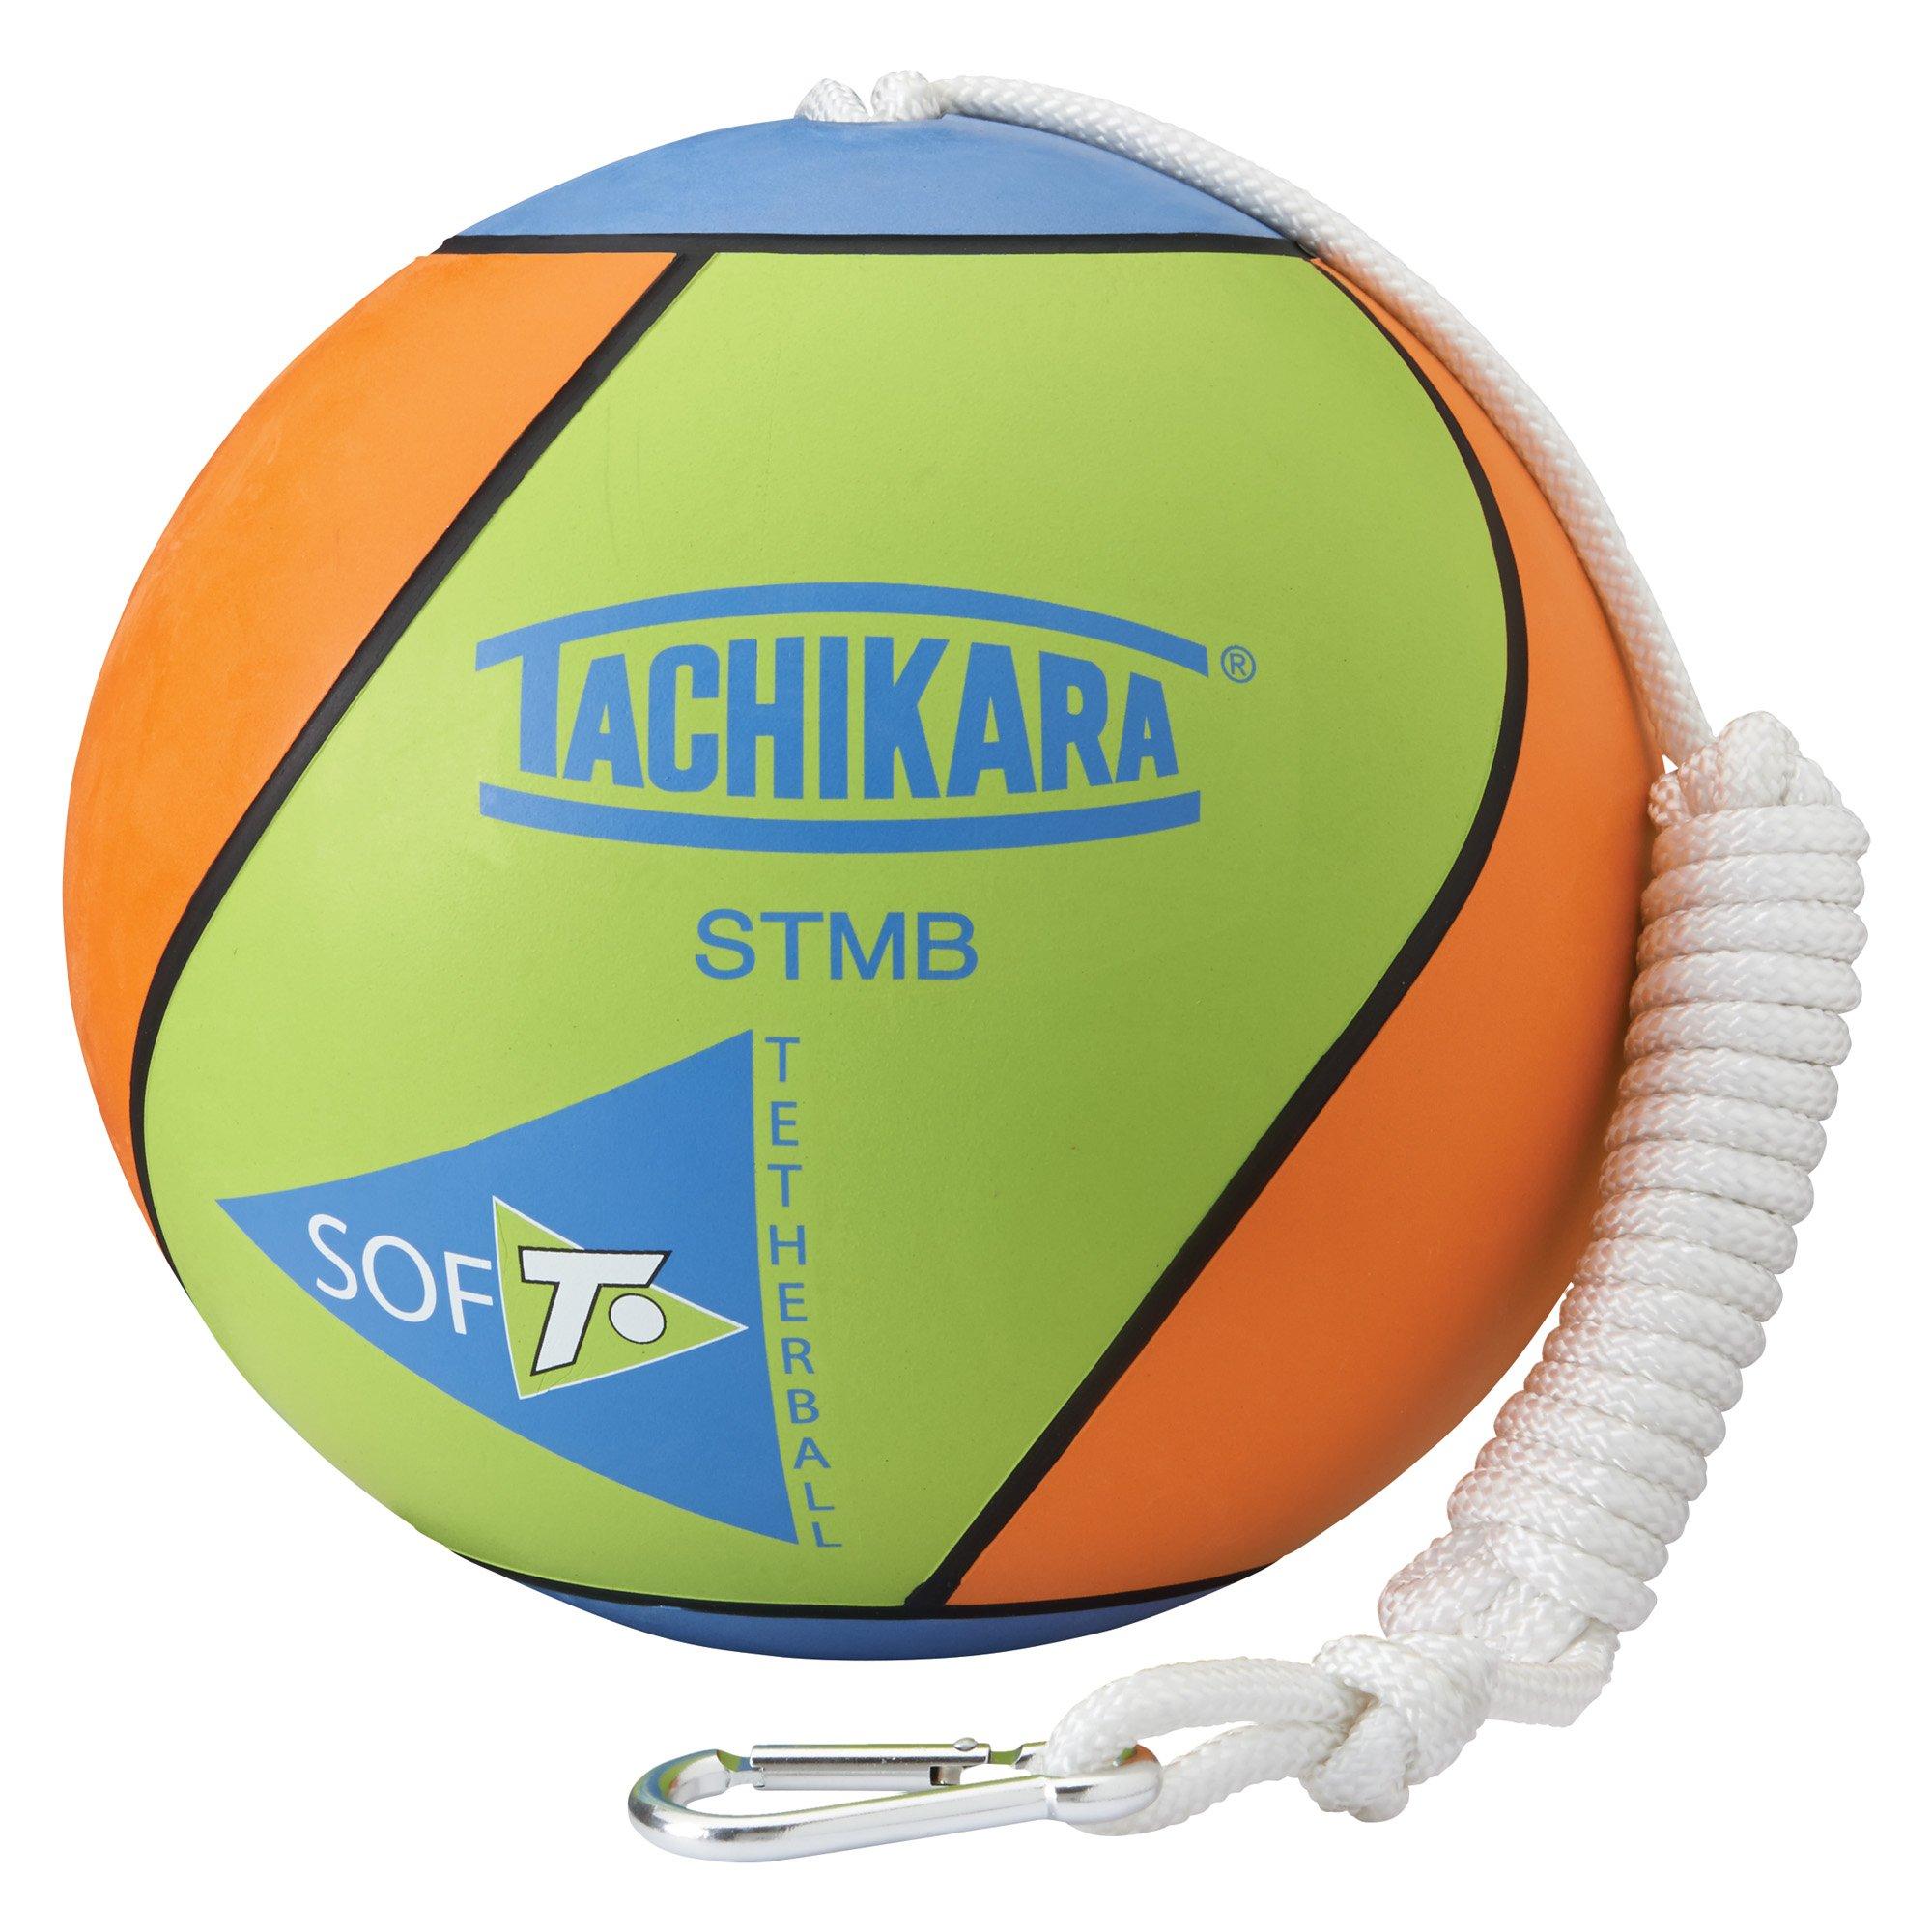 Tachikara STMB Tetherball, Lime Green/Blue/Orange by Tachikara